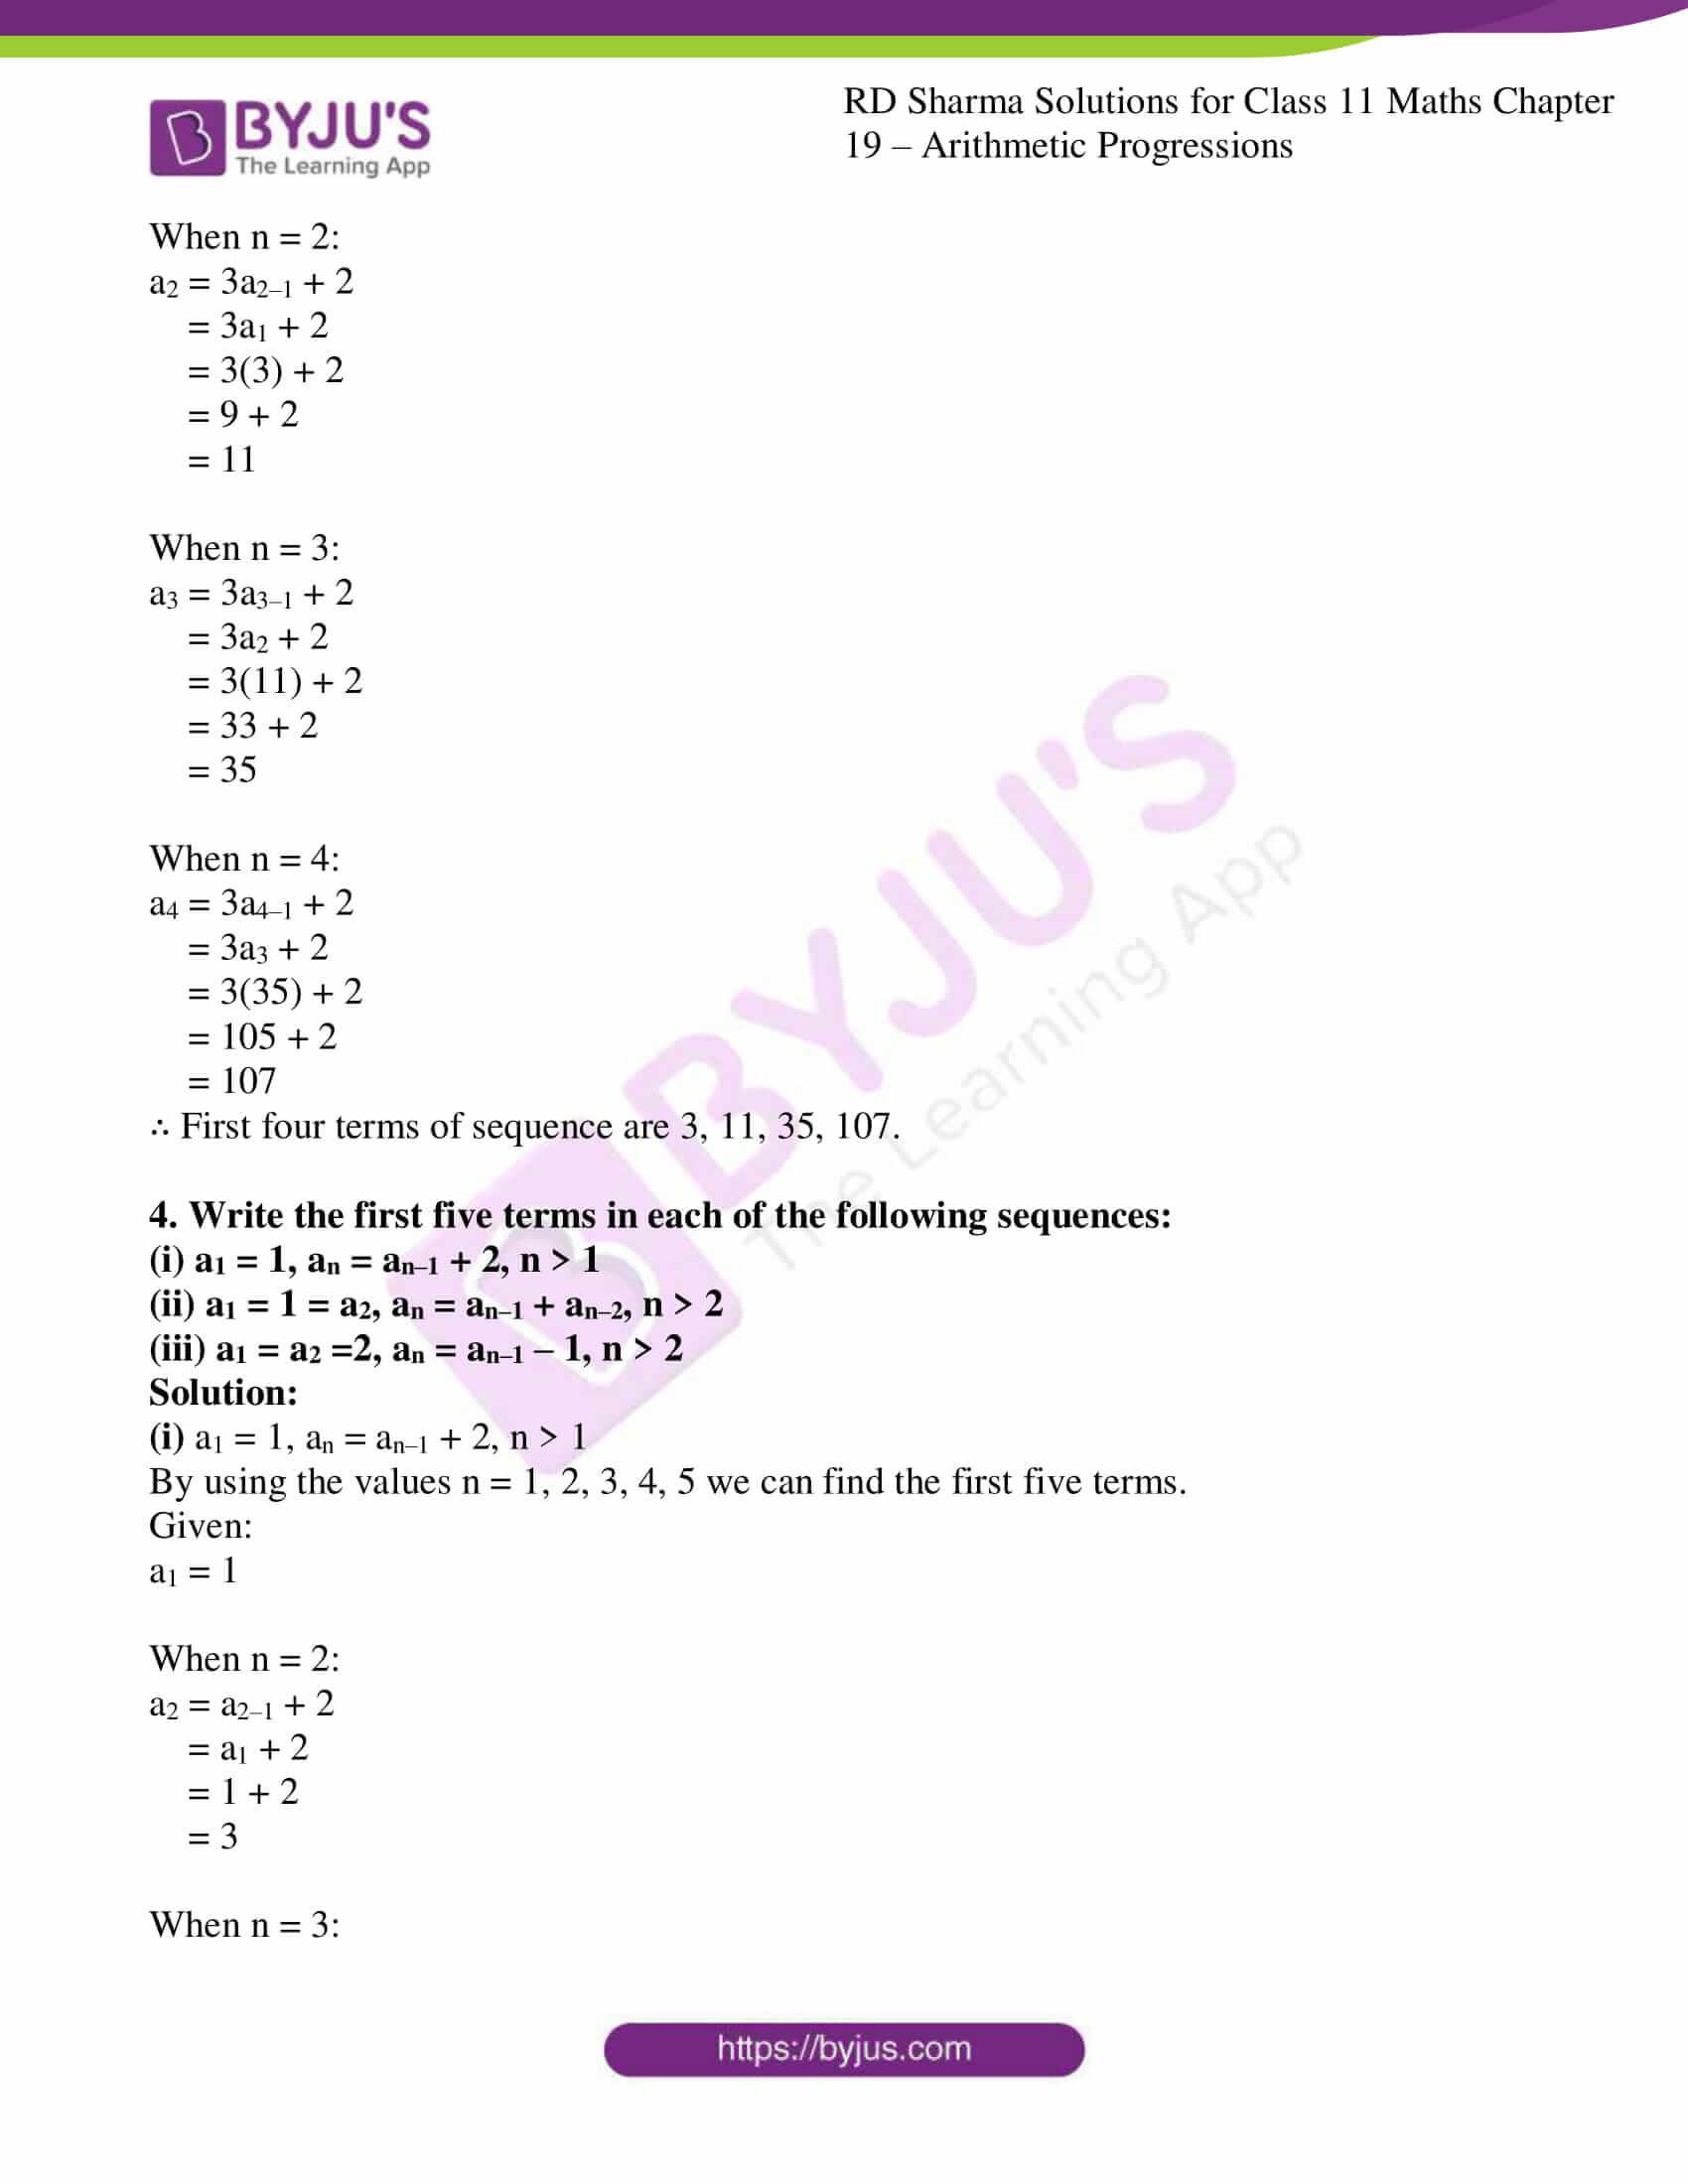 rd sharma class 11 maths ch 19 ex 1 3